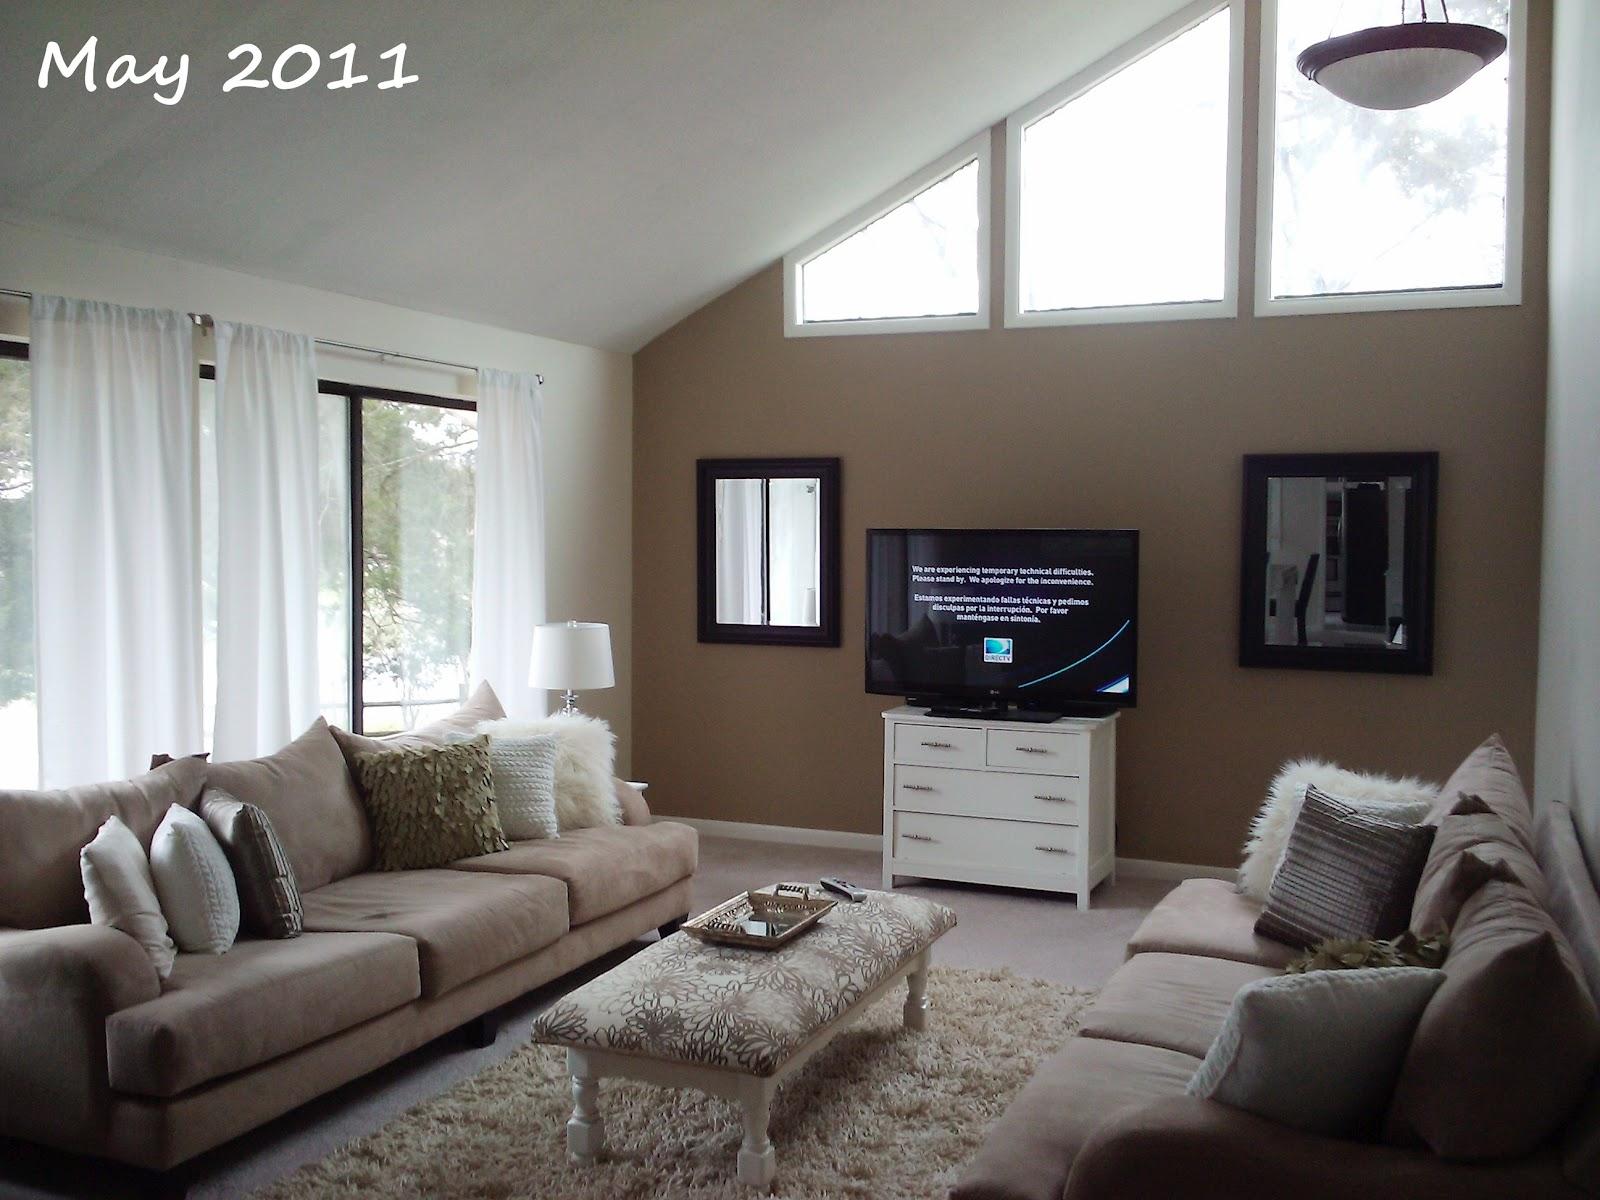 livelovediy how to decorate a living room 2 years of design flops. Black Bedroom Furniture Sets. Home Design Ideas